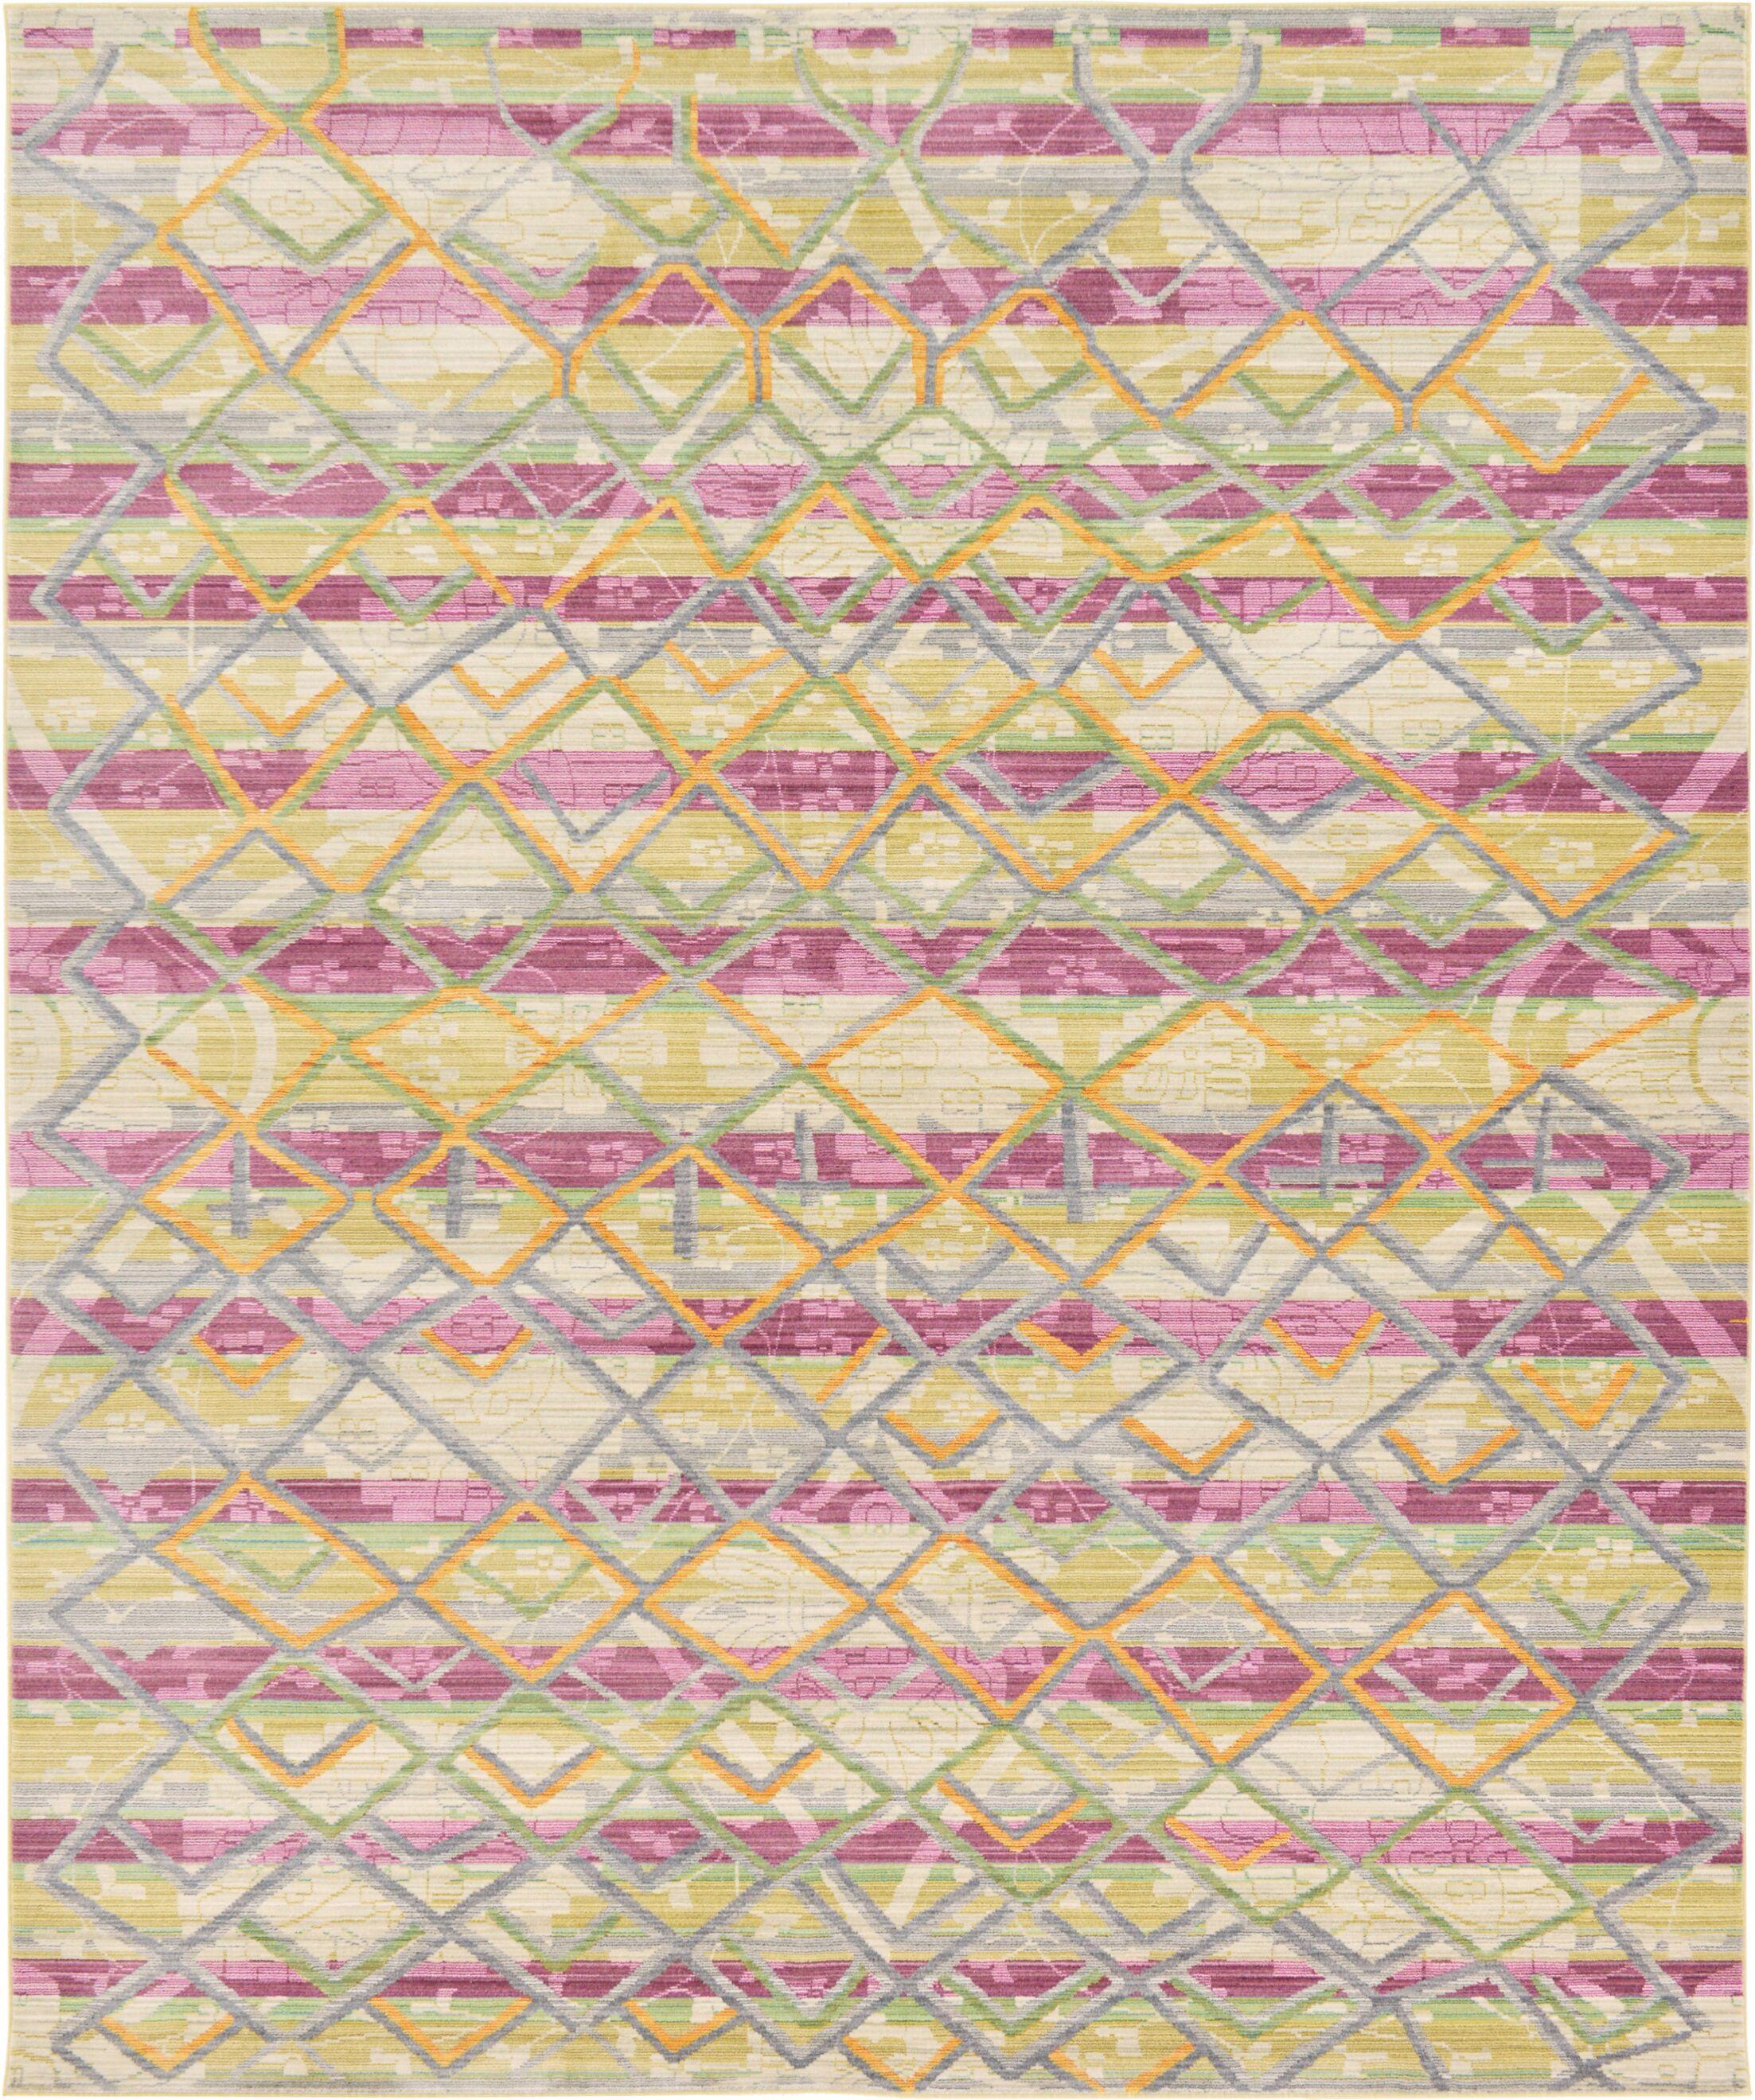 Rune Beige Area Rug Rug Size: Rectangle 8' x 10'